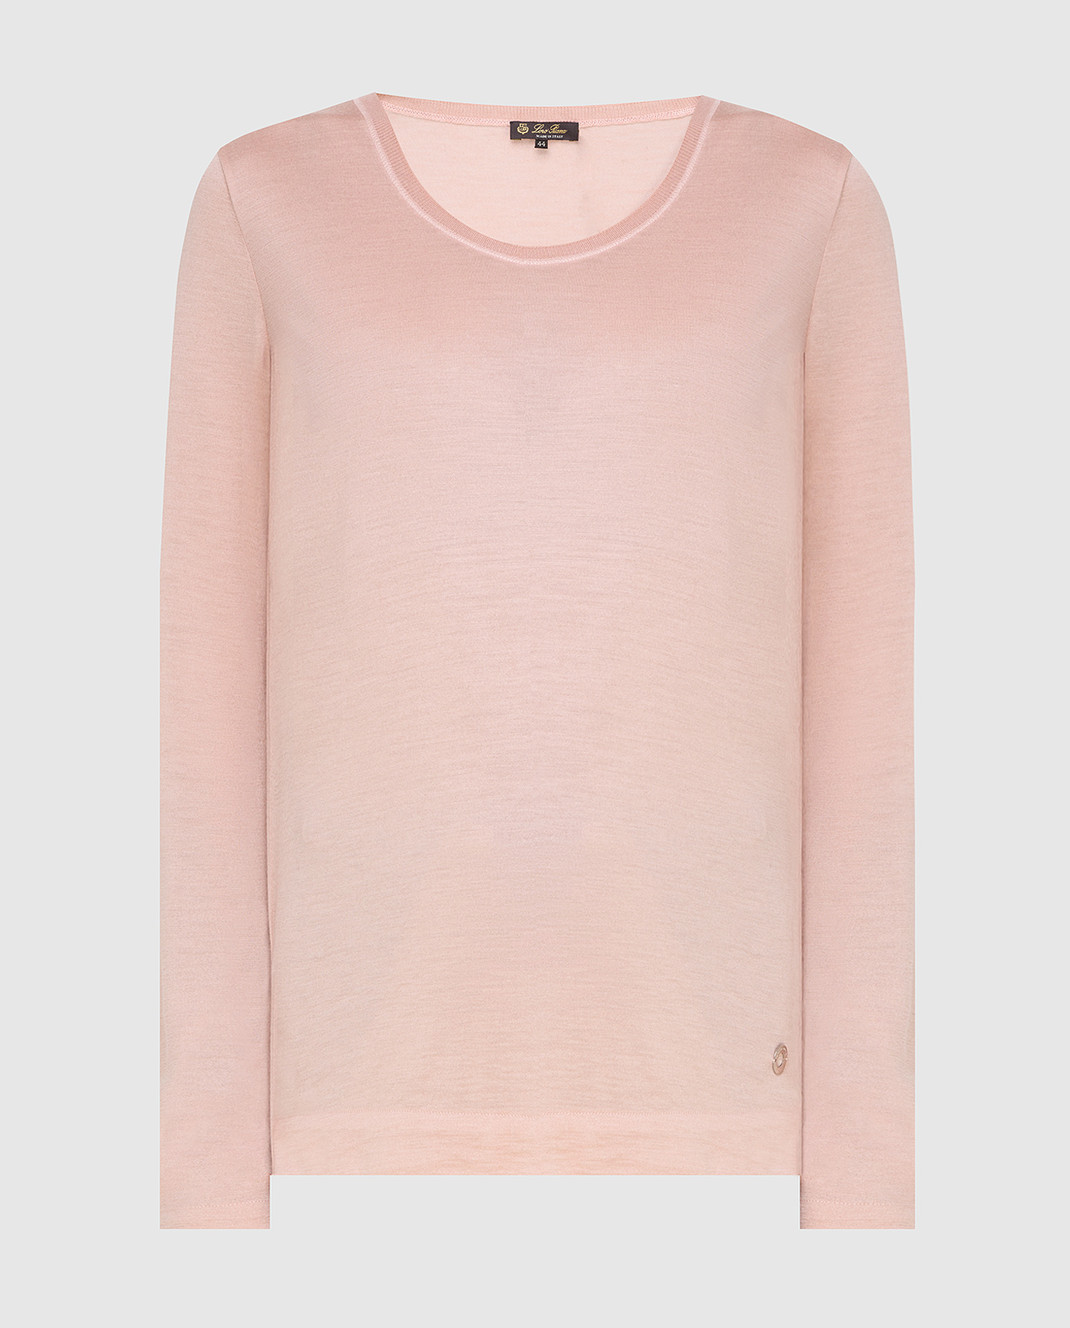 Loro Piana Розовый джемпер из кашемира и шелка F2FAE5730